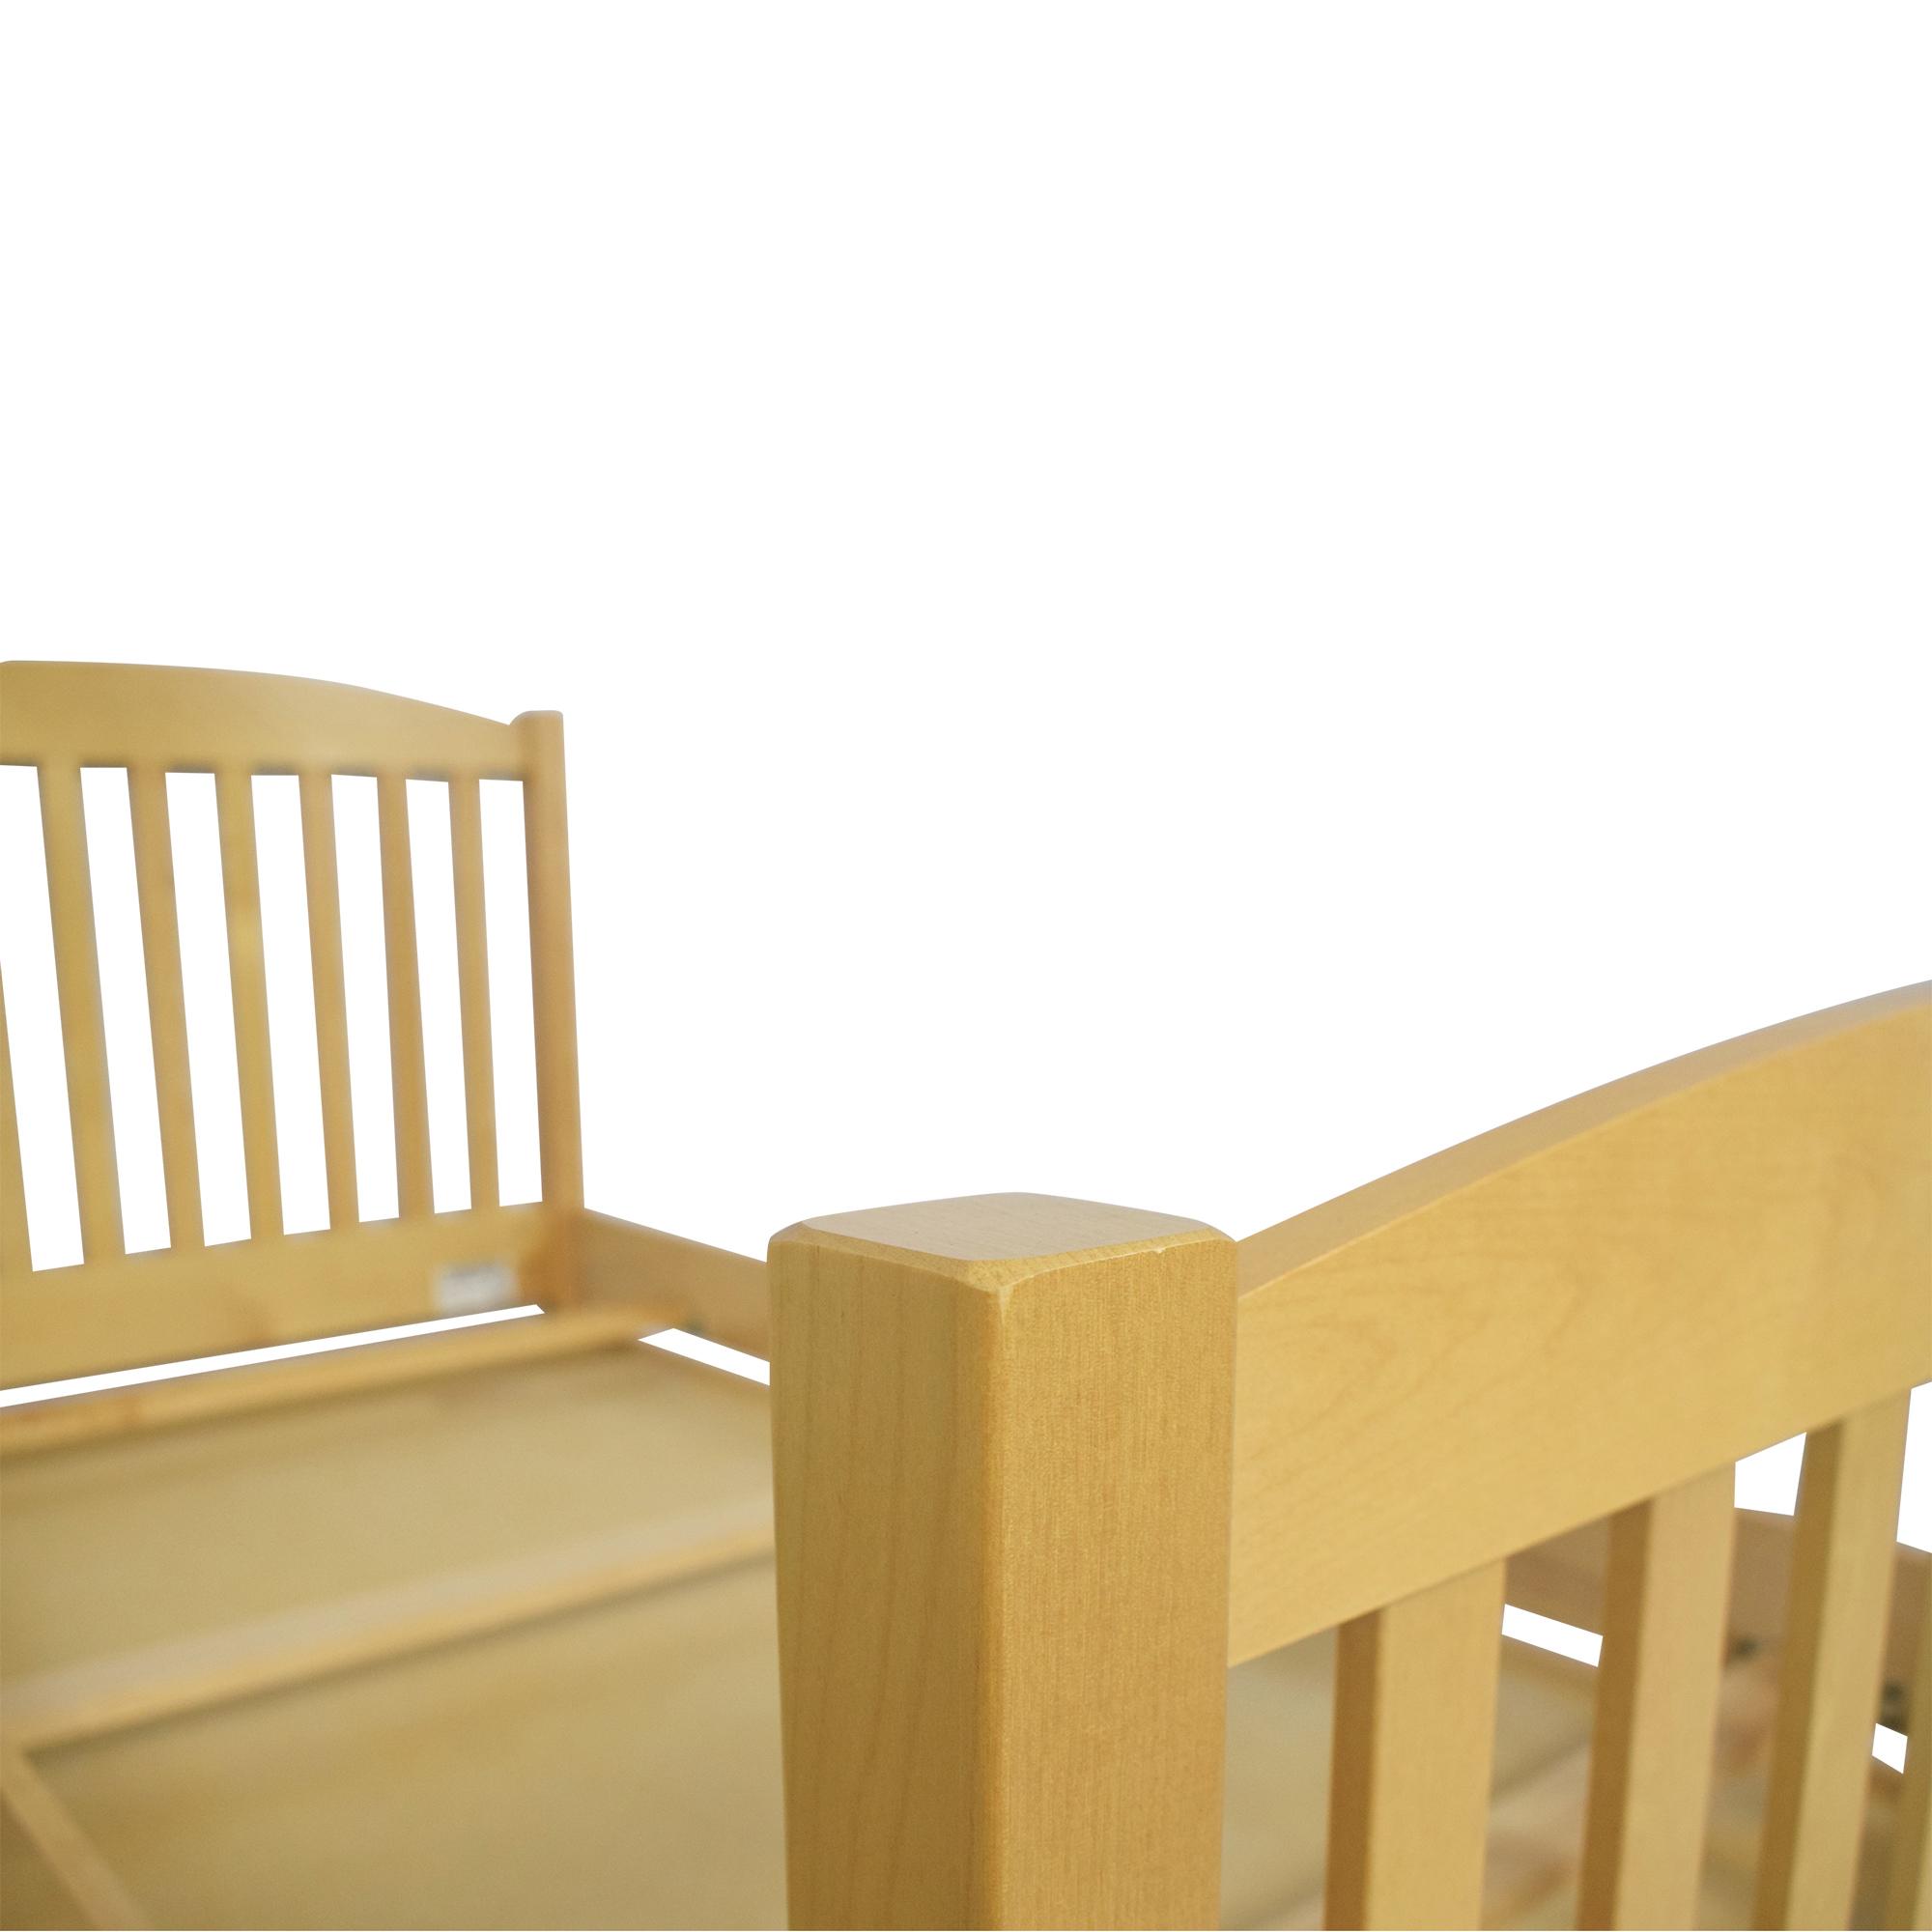 AP Industries AP Industries Twin Bed with Storage used